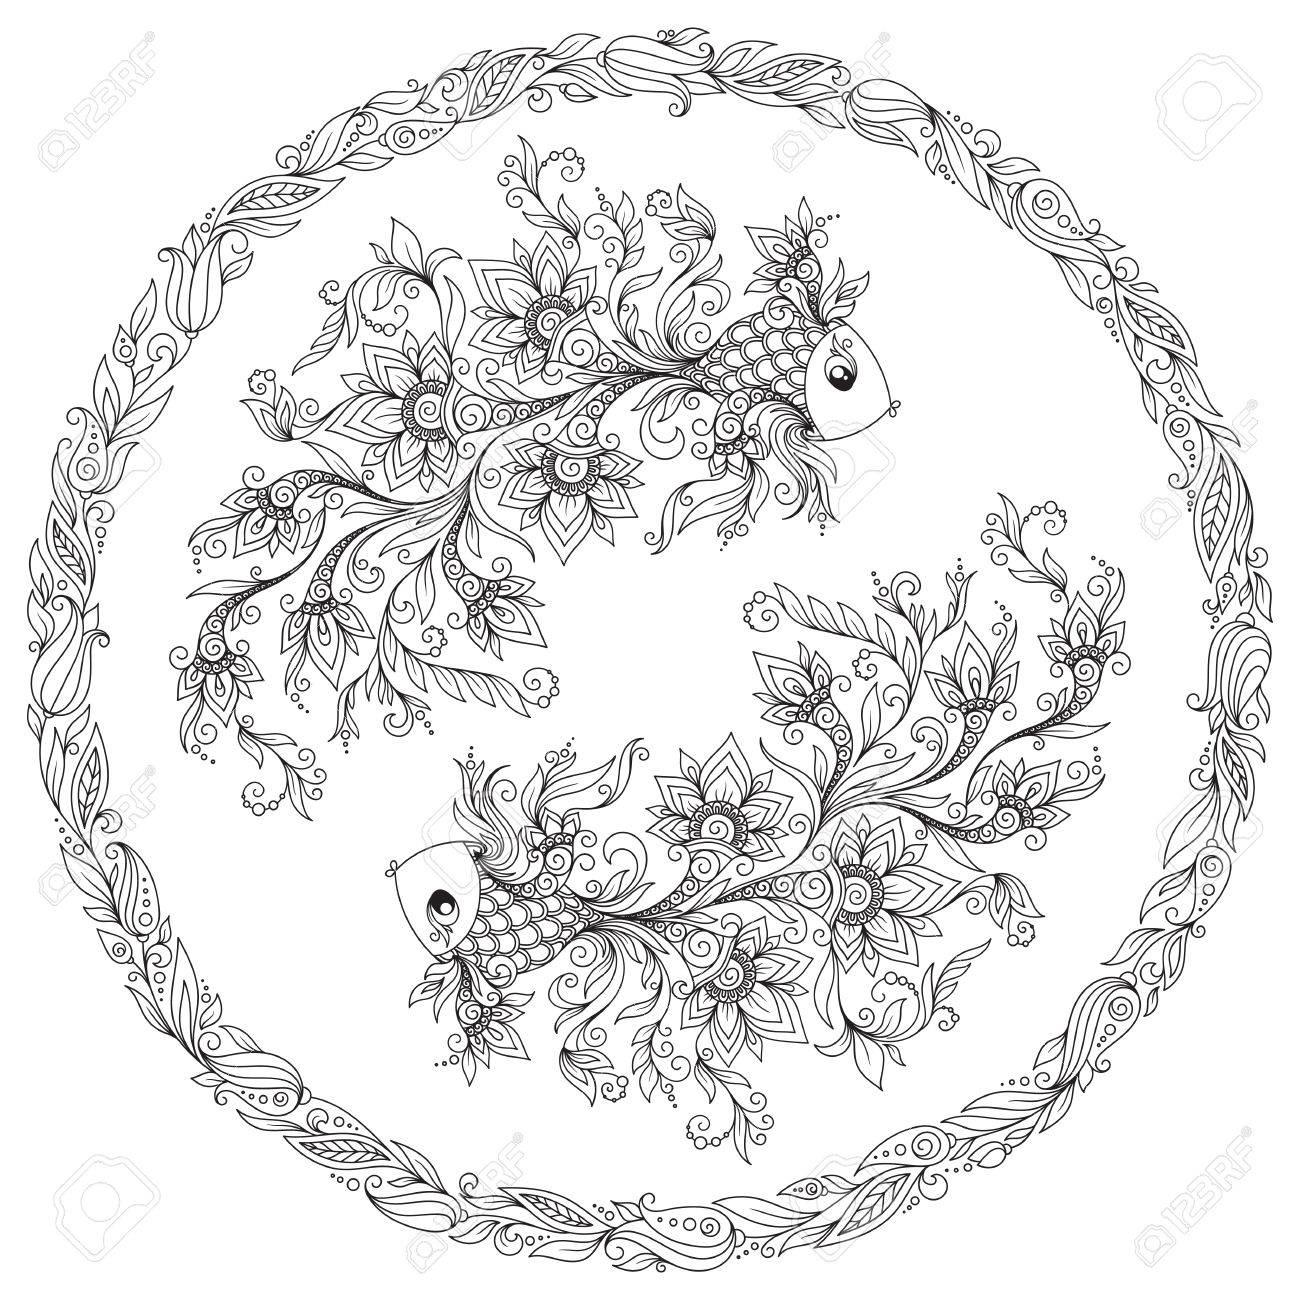 Hand Drawn Line Flowers Art Of Zodiac Pisces Horoscope Symbol